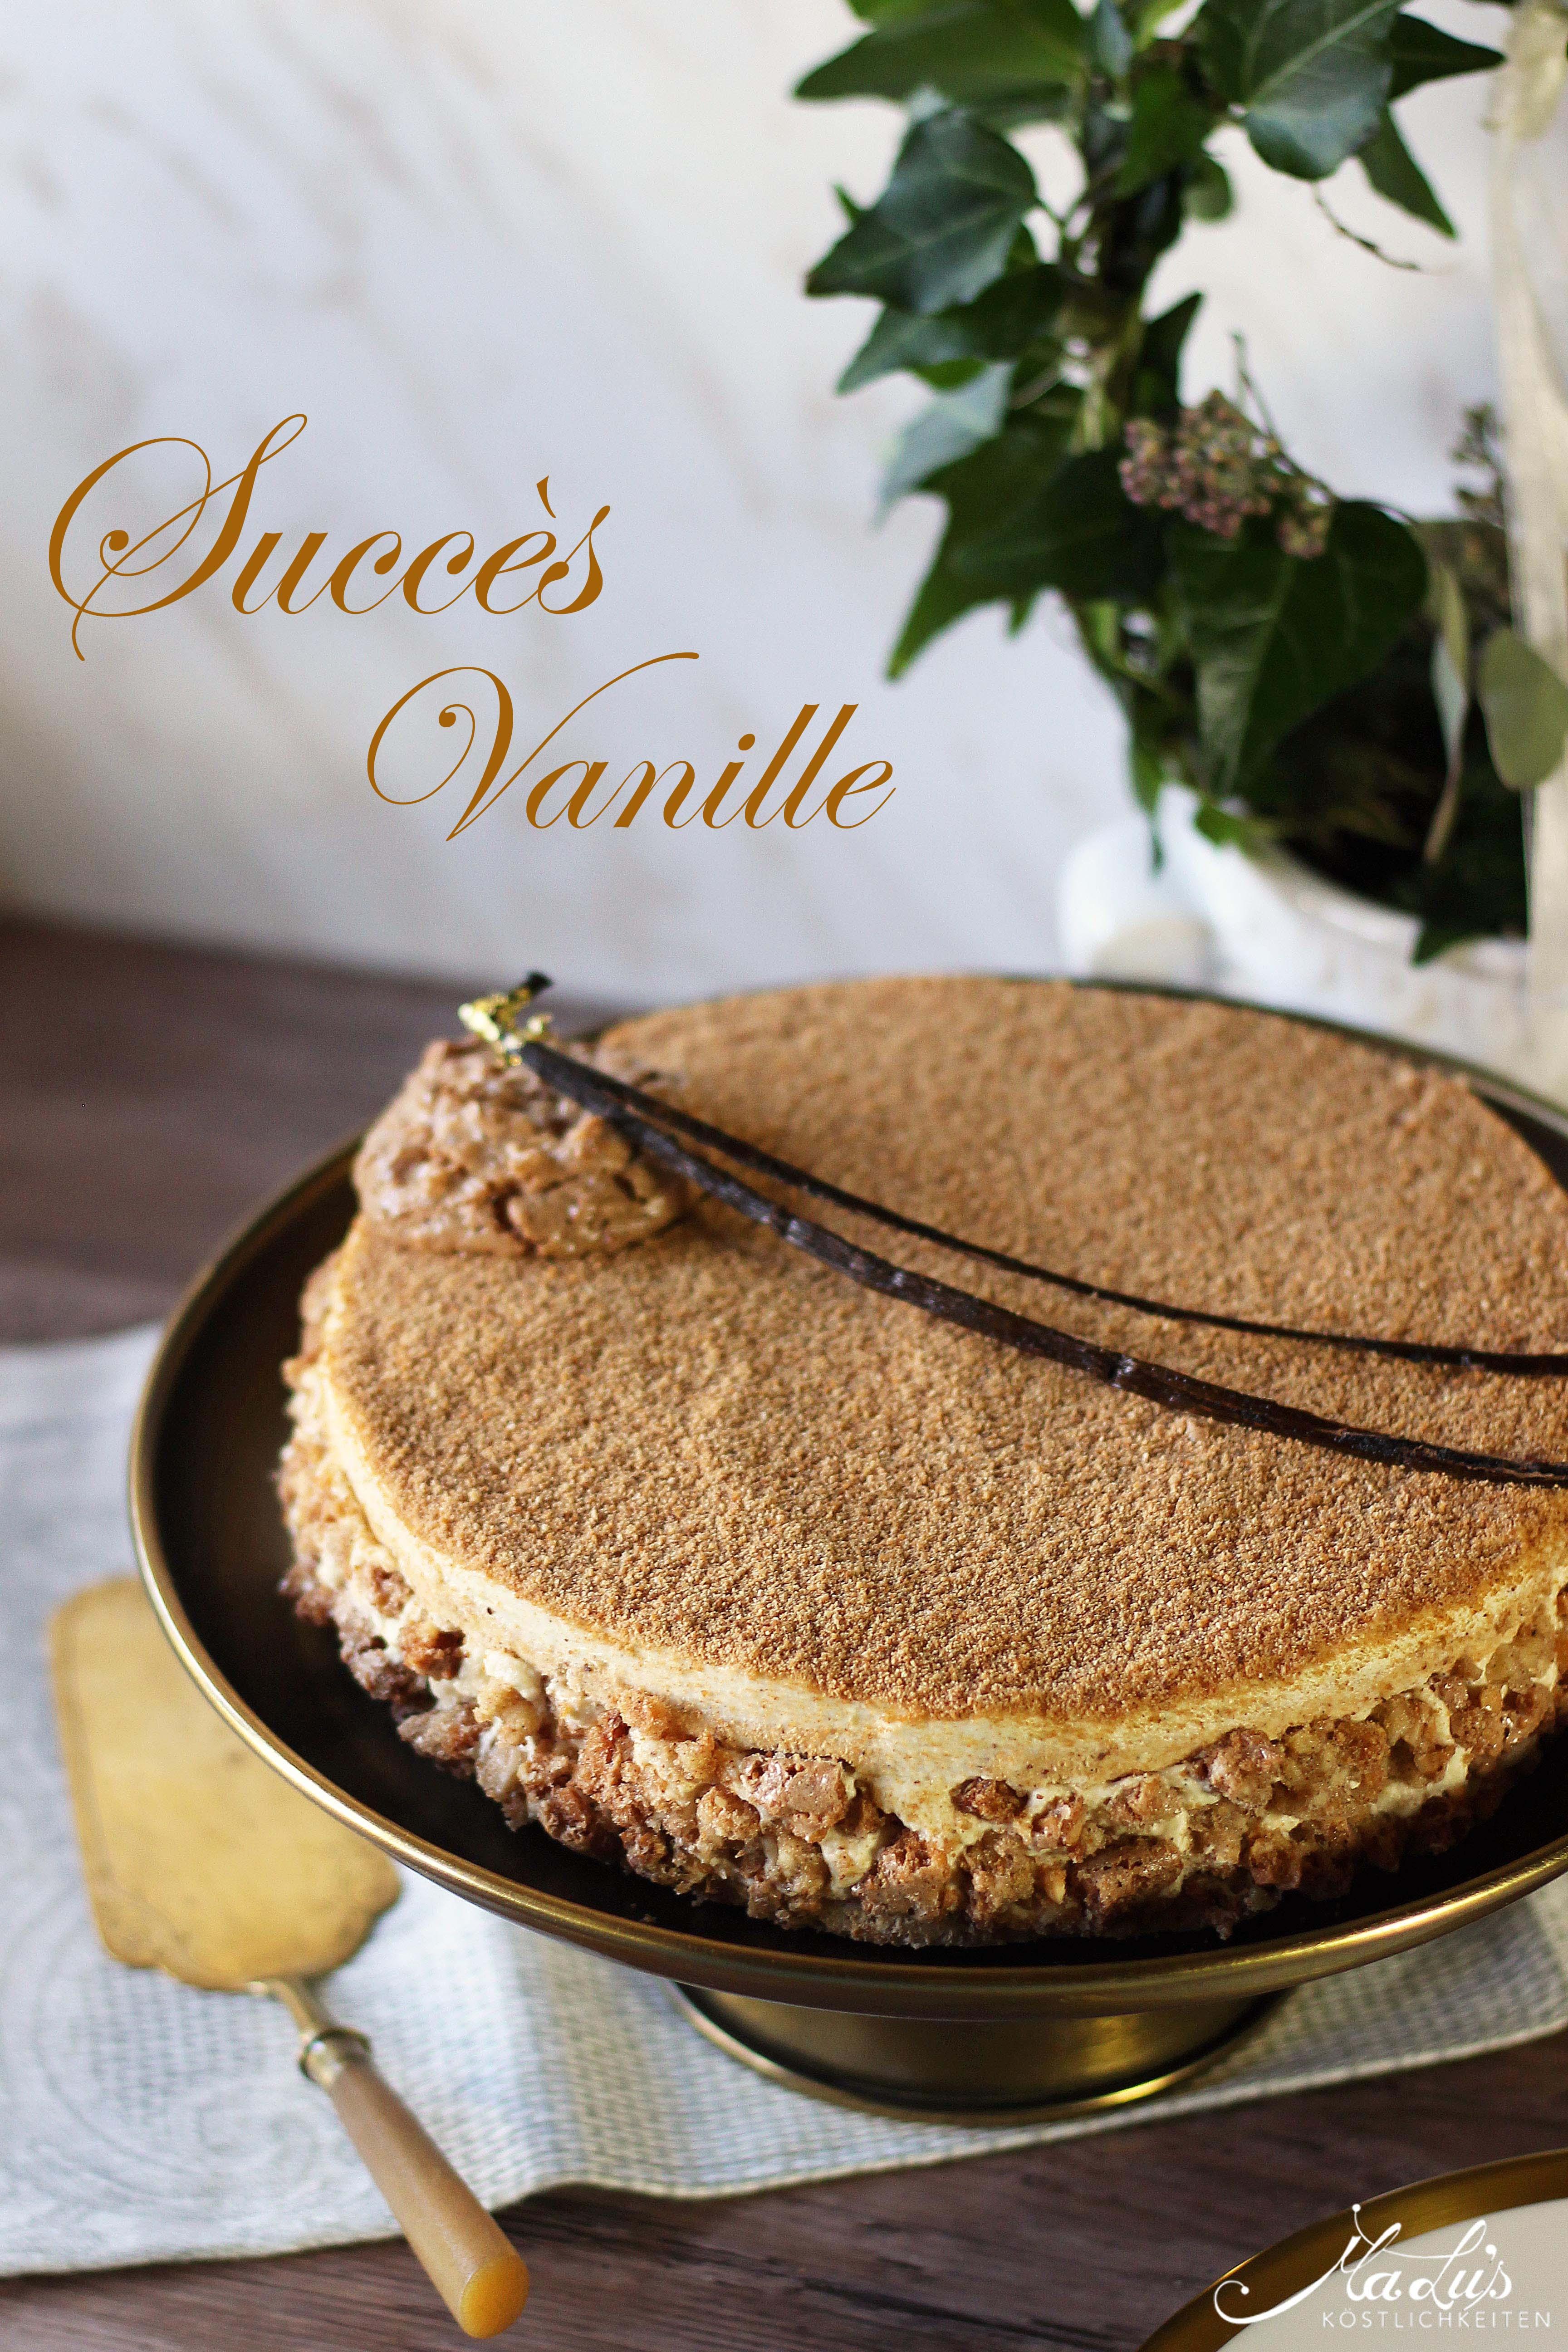 Vanille Mandelbaisertorte - Succès vanille